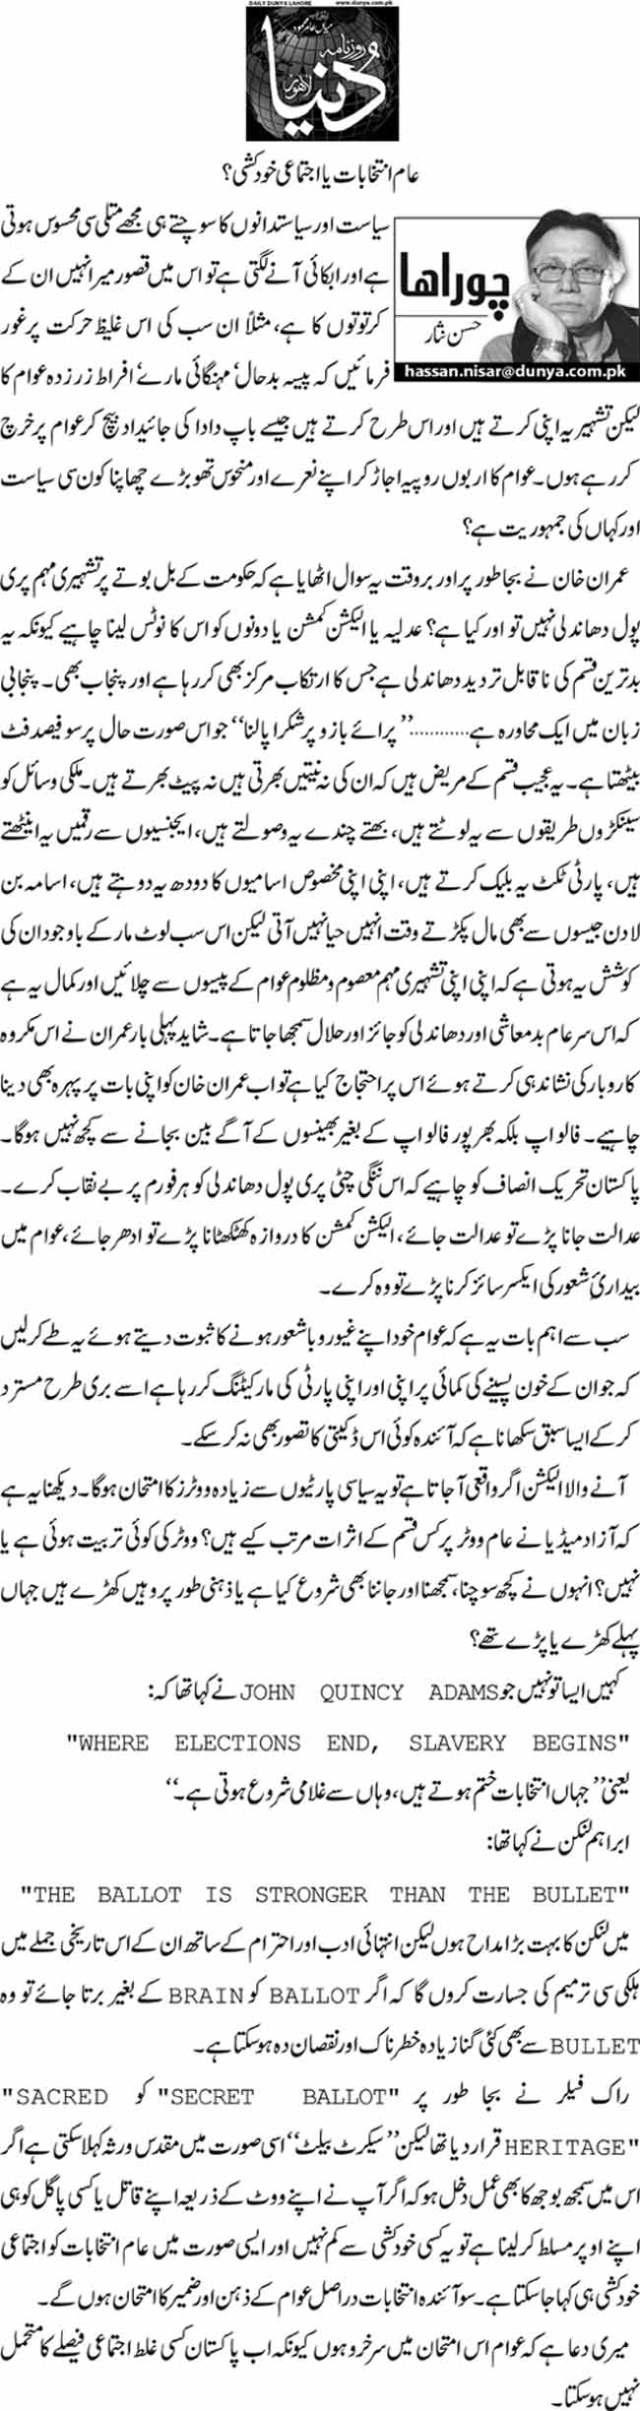 Aam intikhabaat ya ijtimai khudkushi - Hassan Nisar